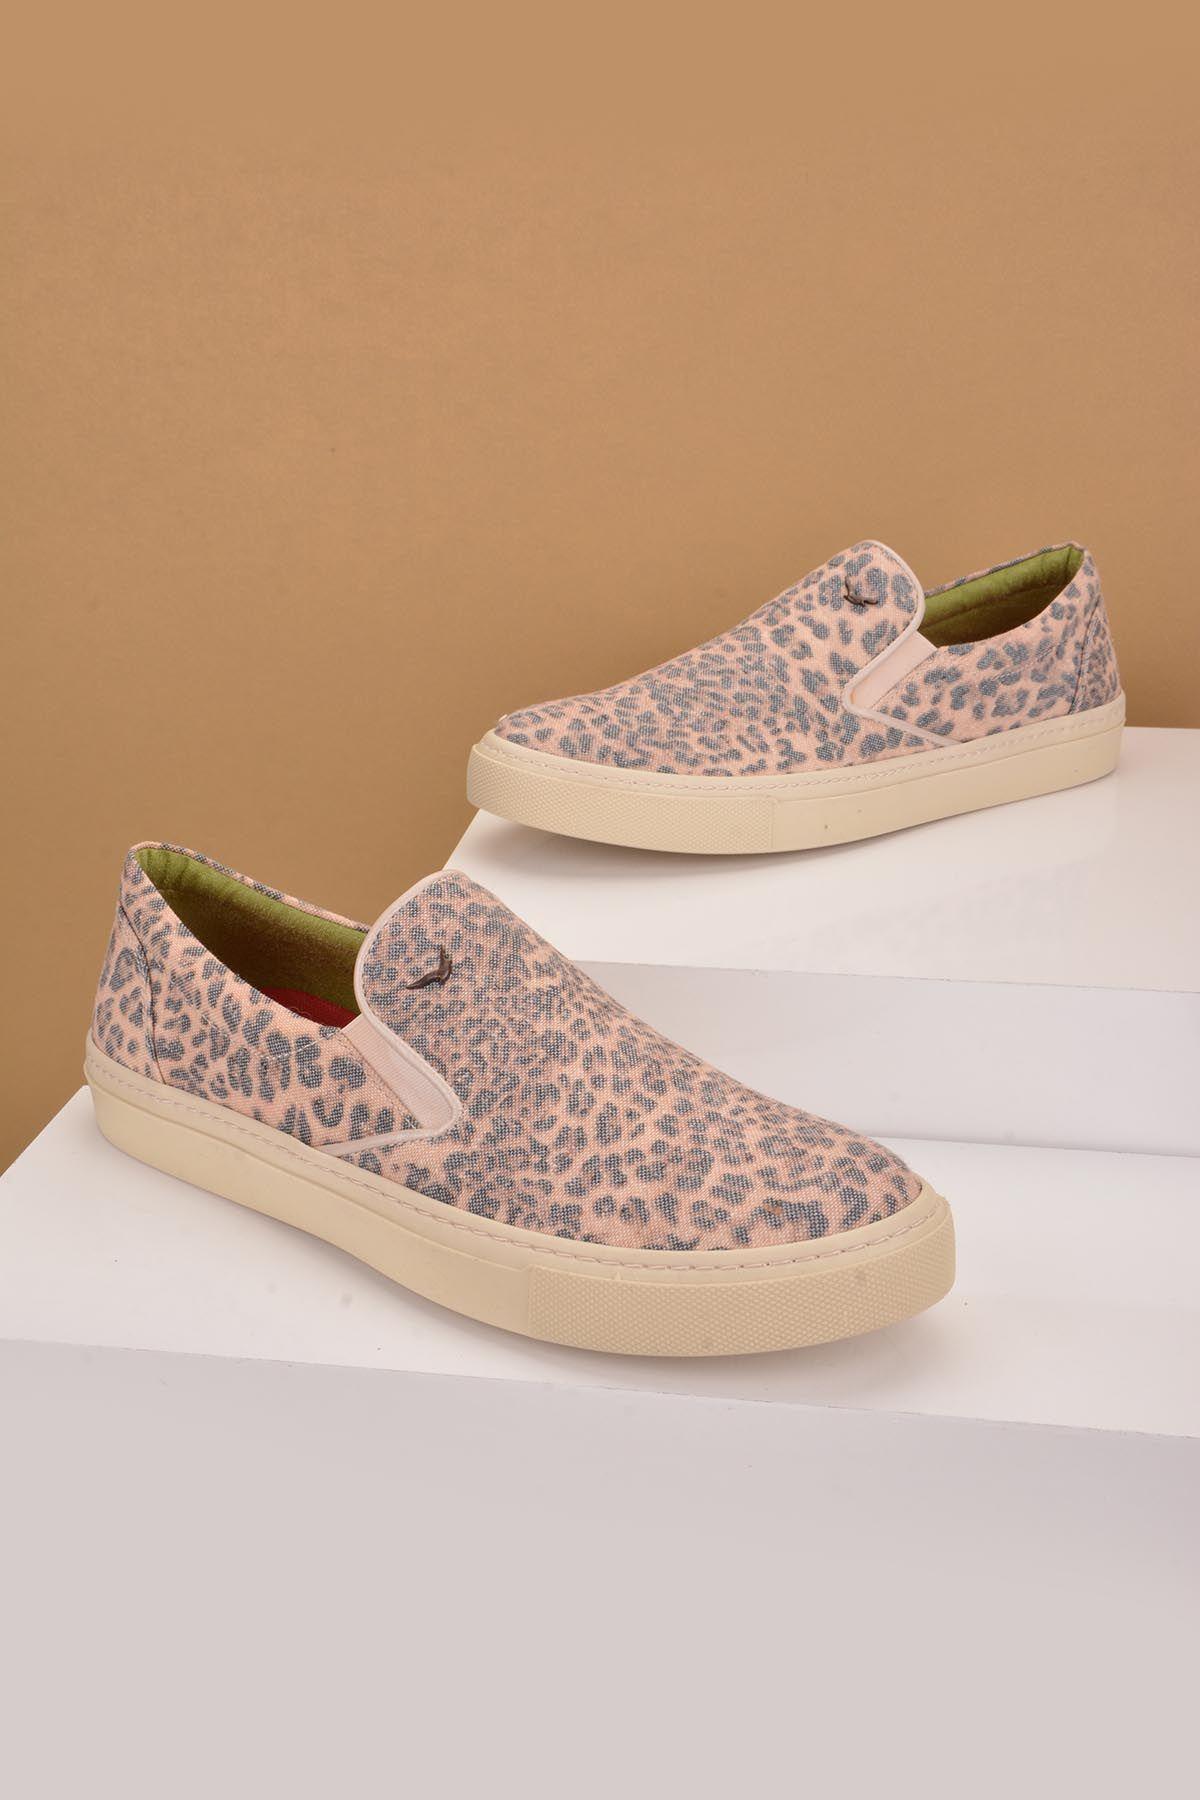 Art Goya Women Sneakers From Linen With Leopard Printing Powdery